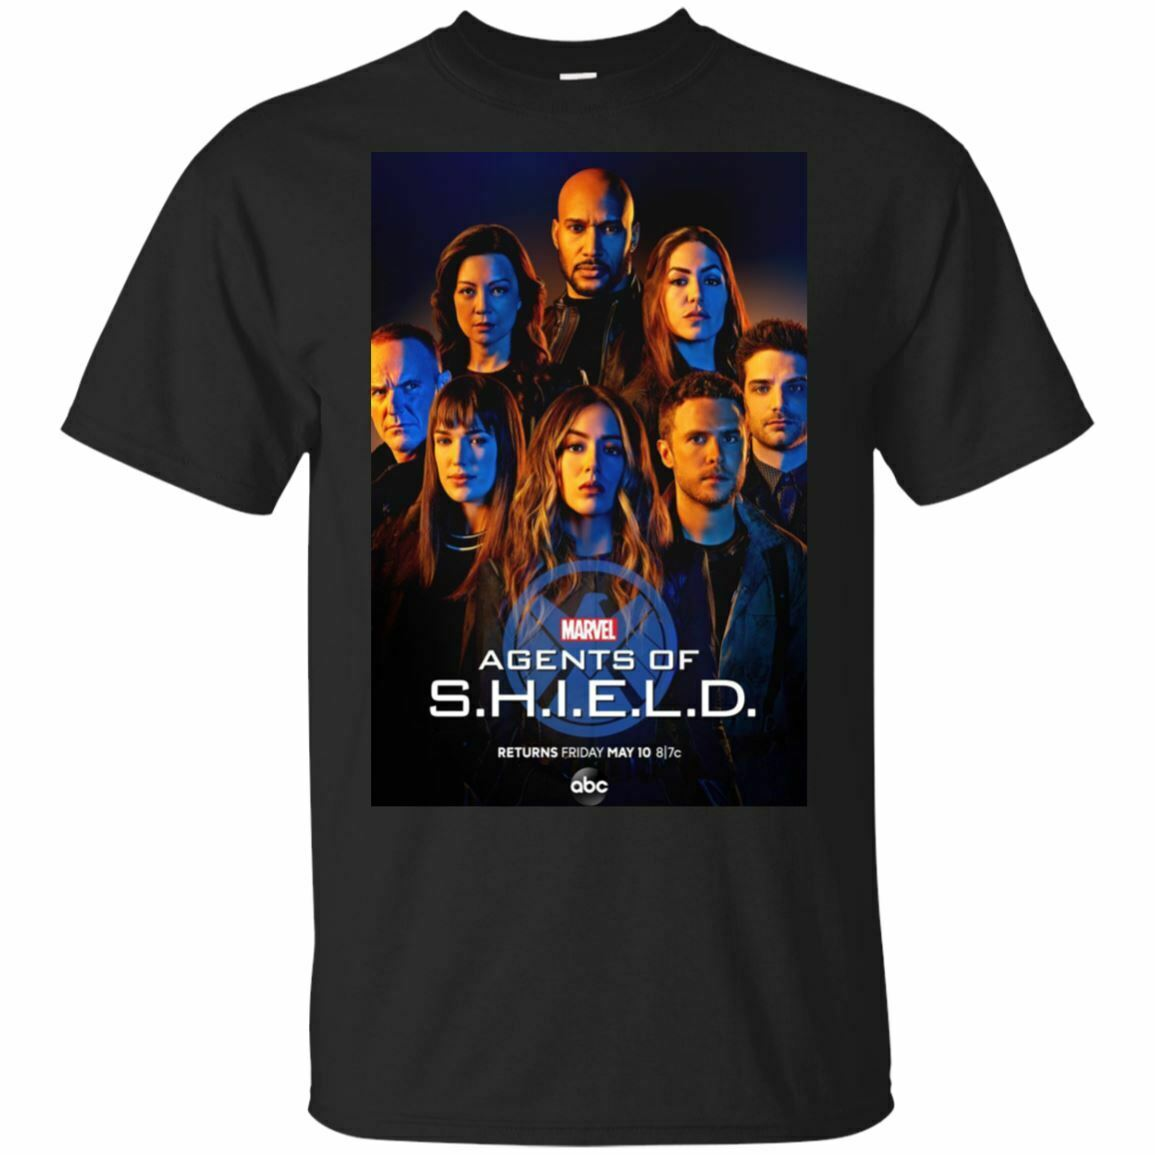 Los agentes de S H que E L D Camiseta 2019 Marvel, recién llegado, temporada 6, camisa negra, Camiseta de algodón de alta calidad para hombre